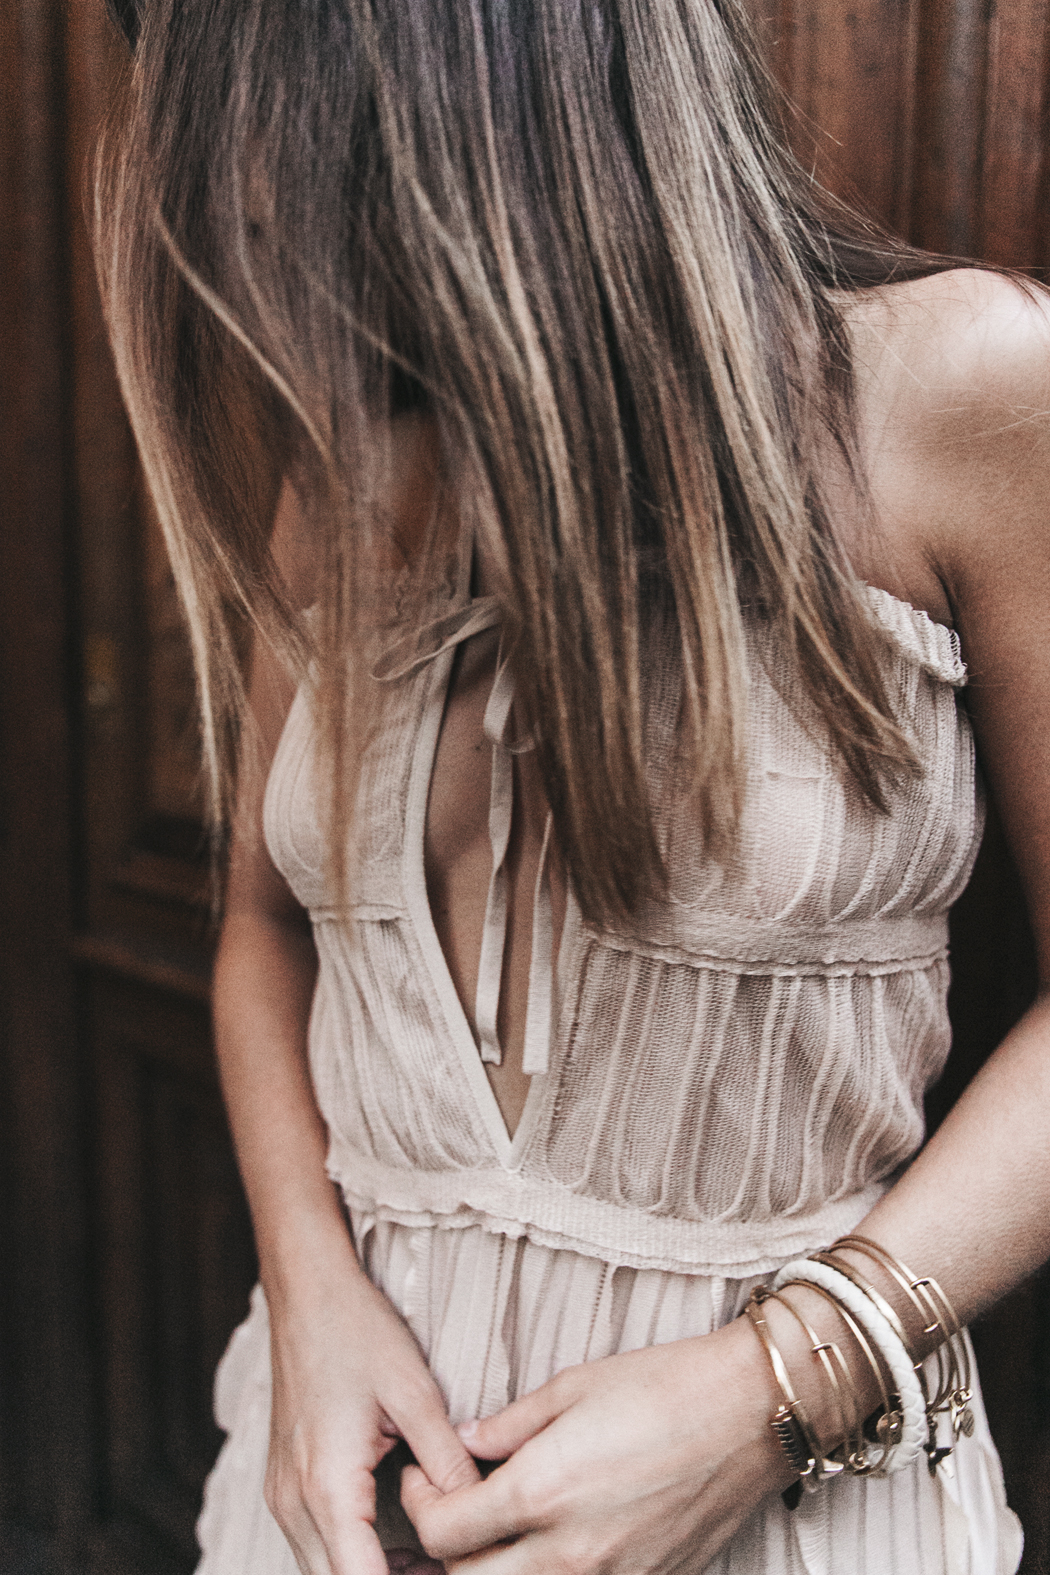 Salvatore_Ferragamo-Edgardo_Osorio_for_Ferragamo_Shoes_Collection-Nude_Dress-Dot_Sandals-Outfit-Collage_Vintage-26